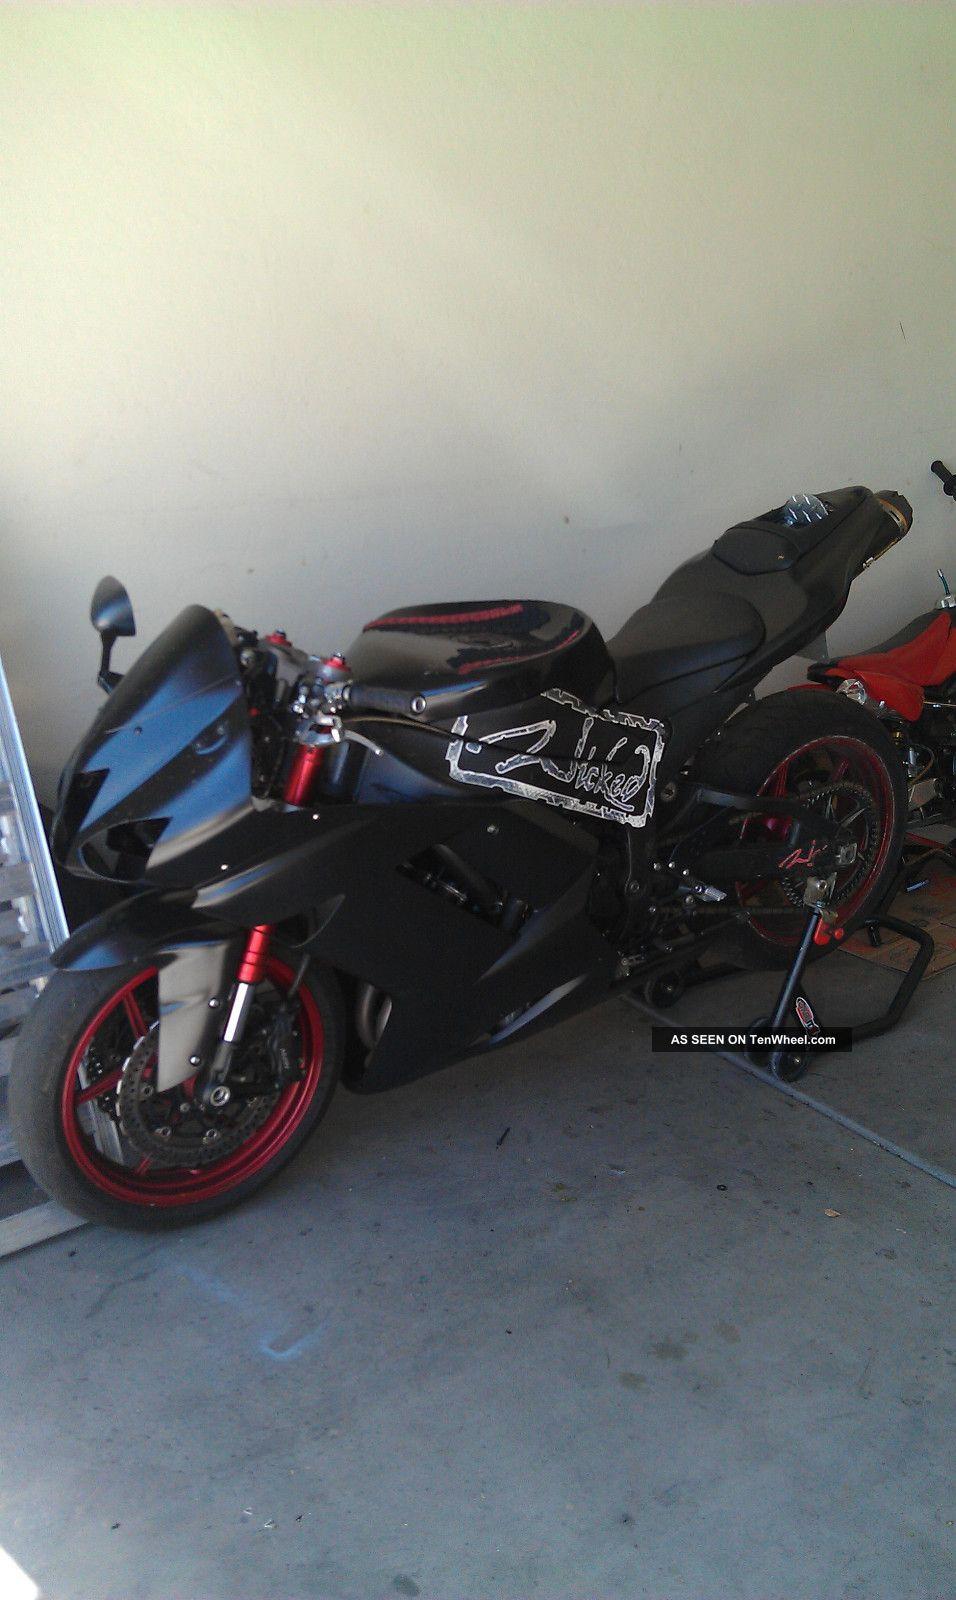 2008 Kawasaki Zx6r Stunt Bike